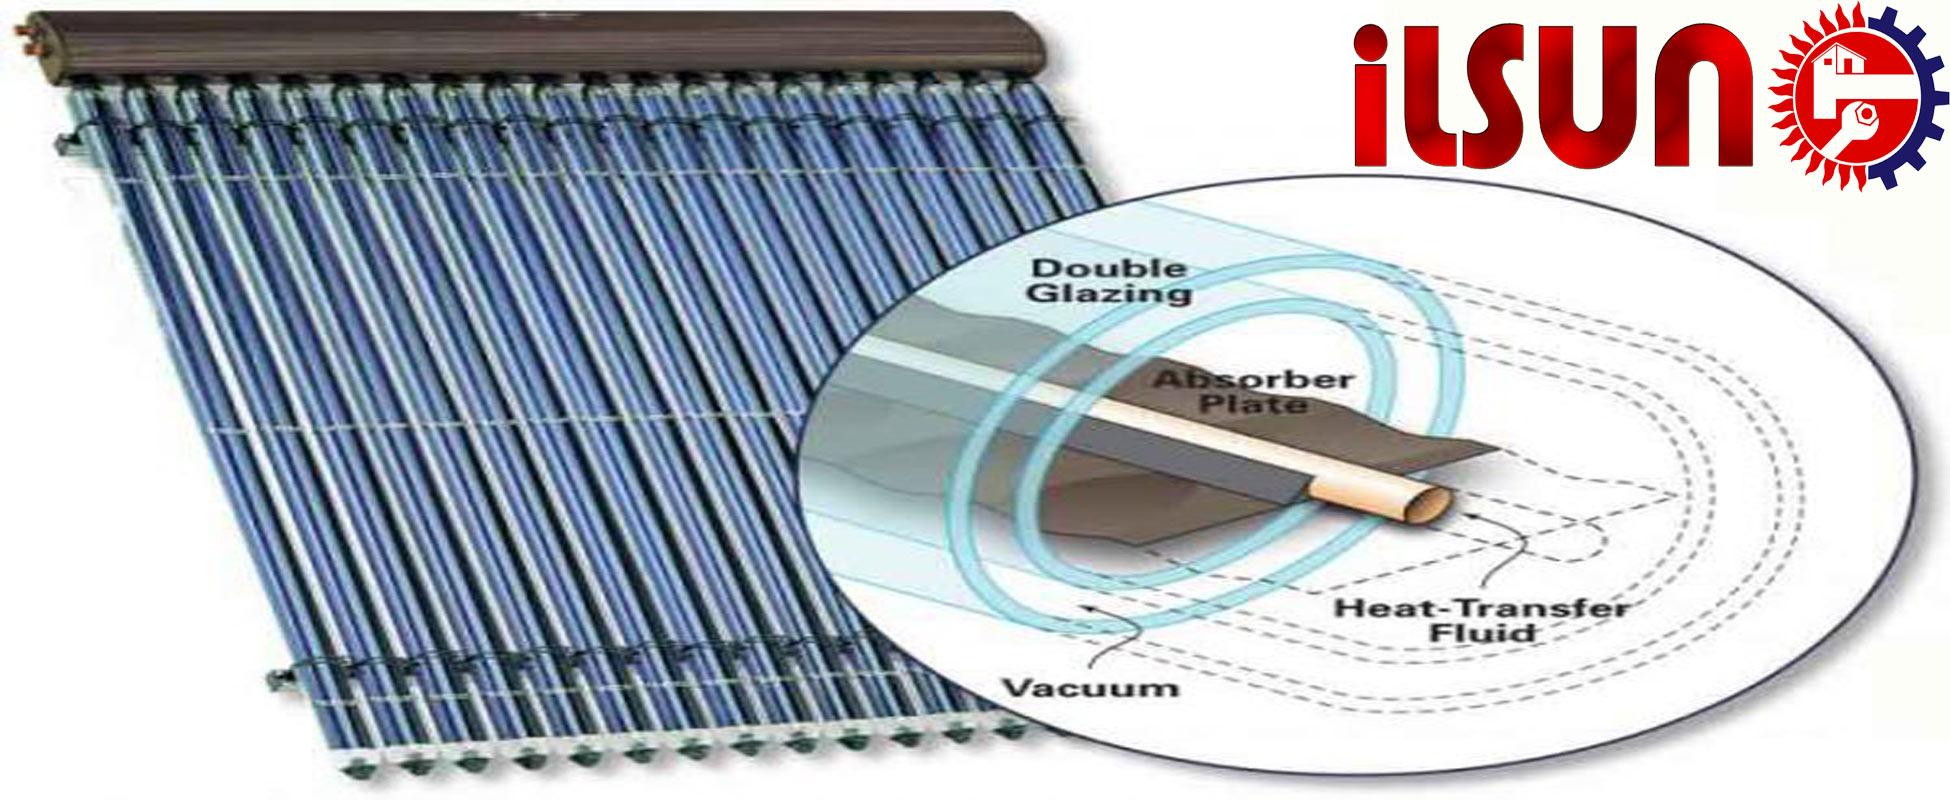 خرید آبگرمکن خورشیدی . آبگرمکن خورشیدی چقدر عمر می کند؟